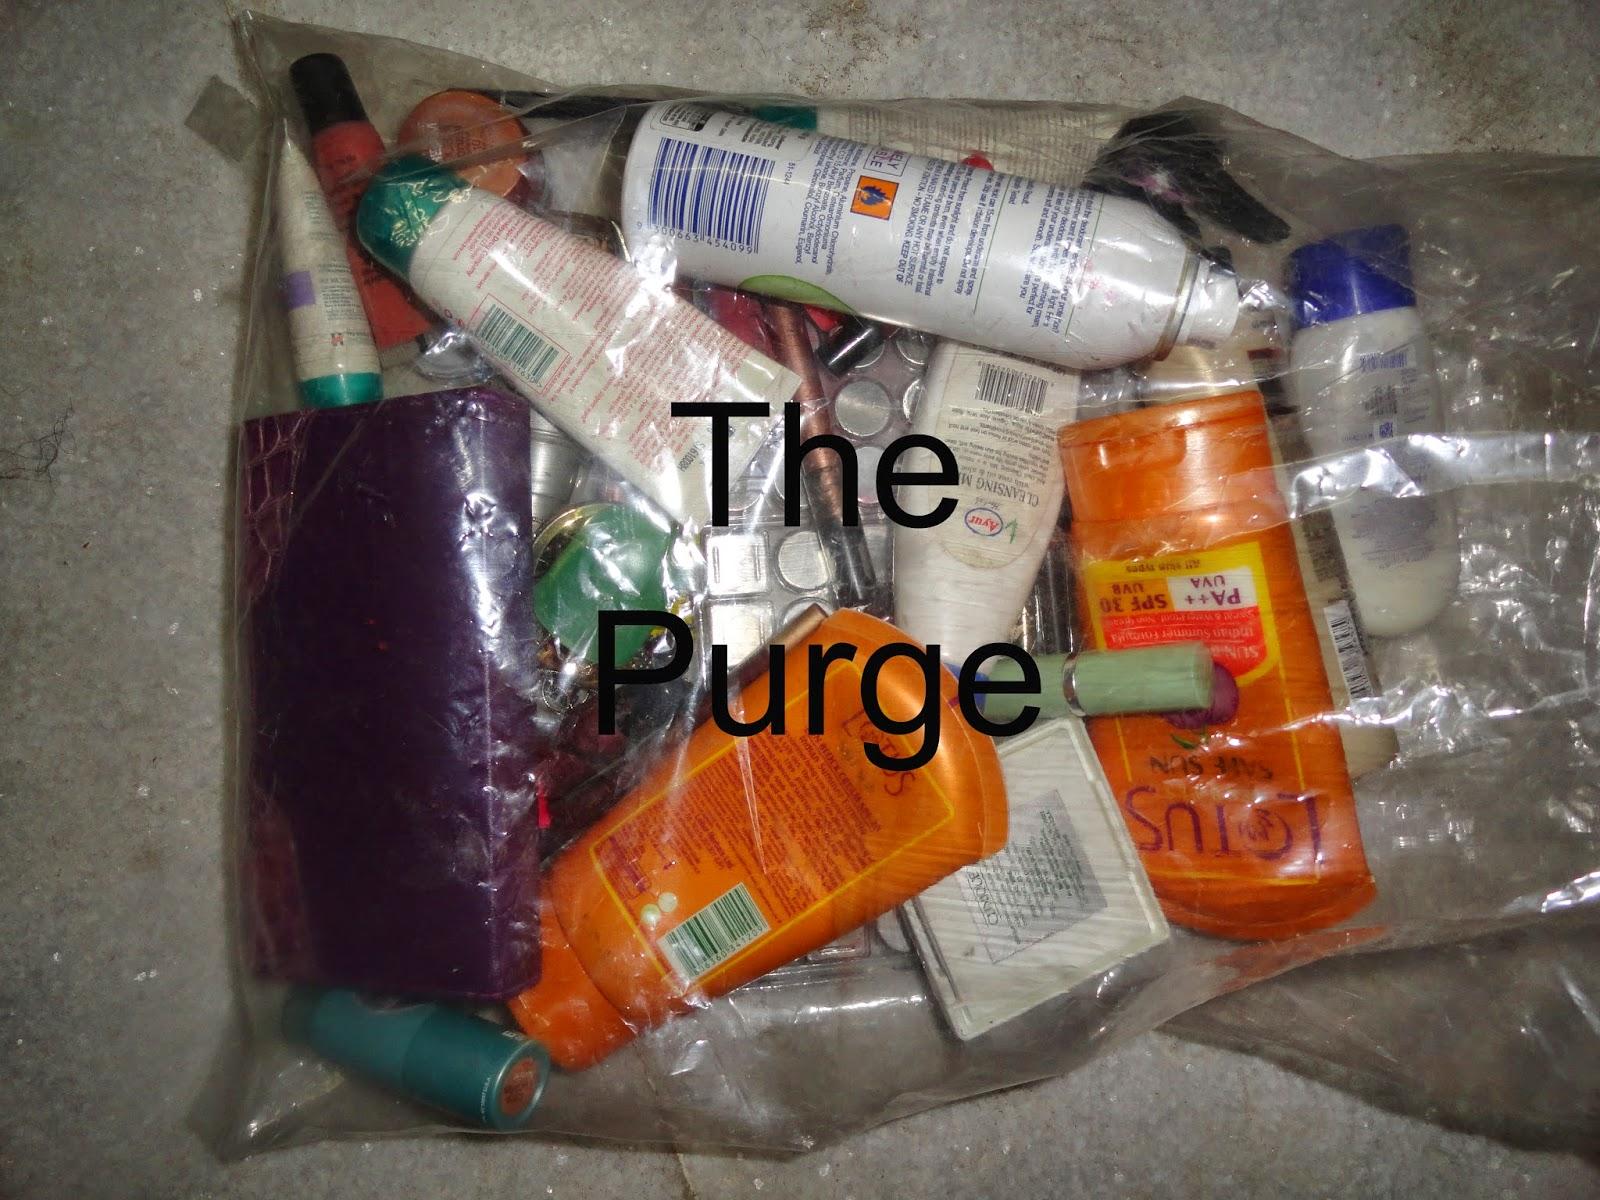 The Purge image